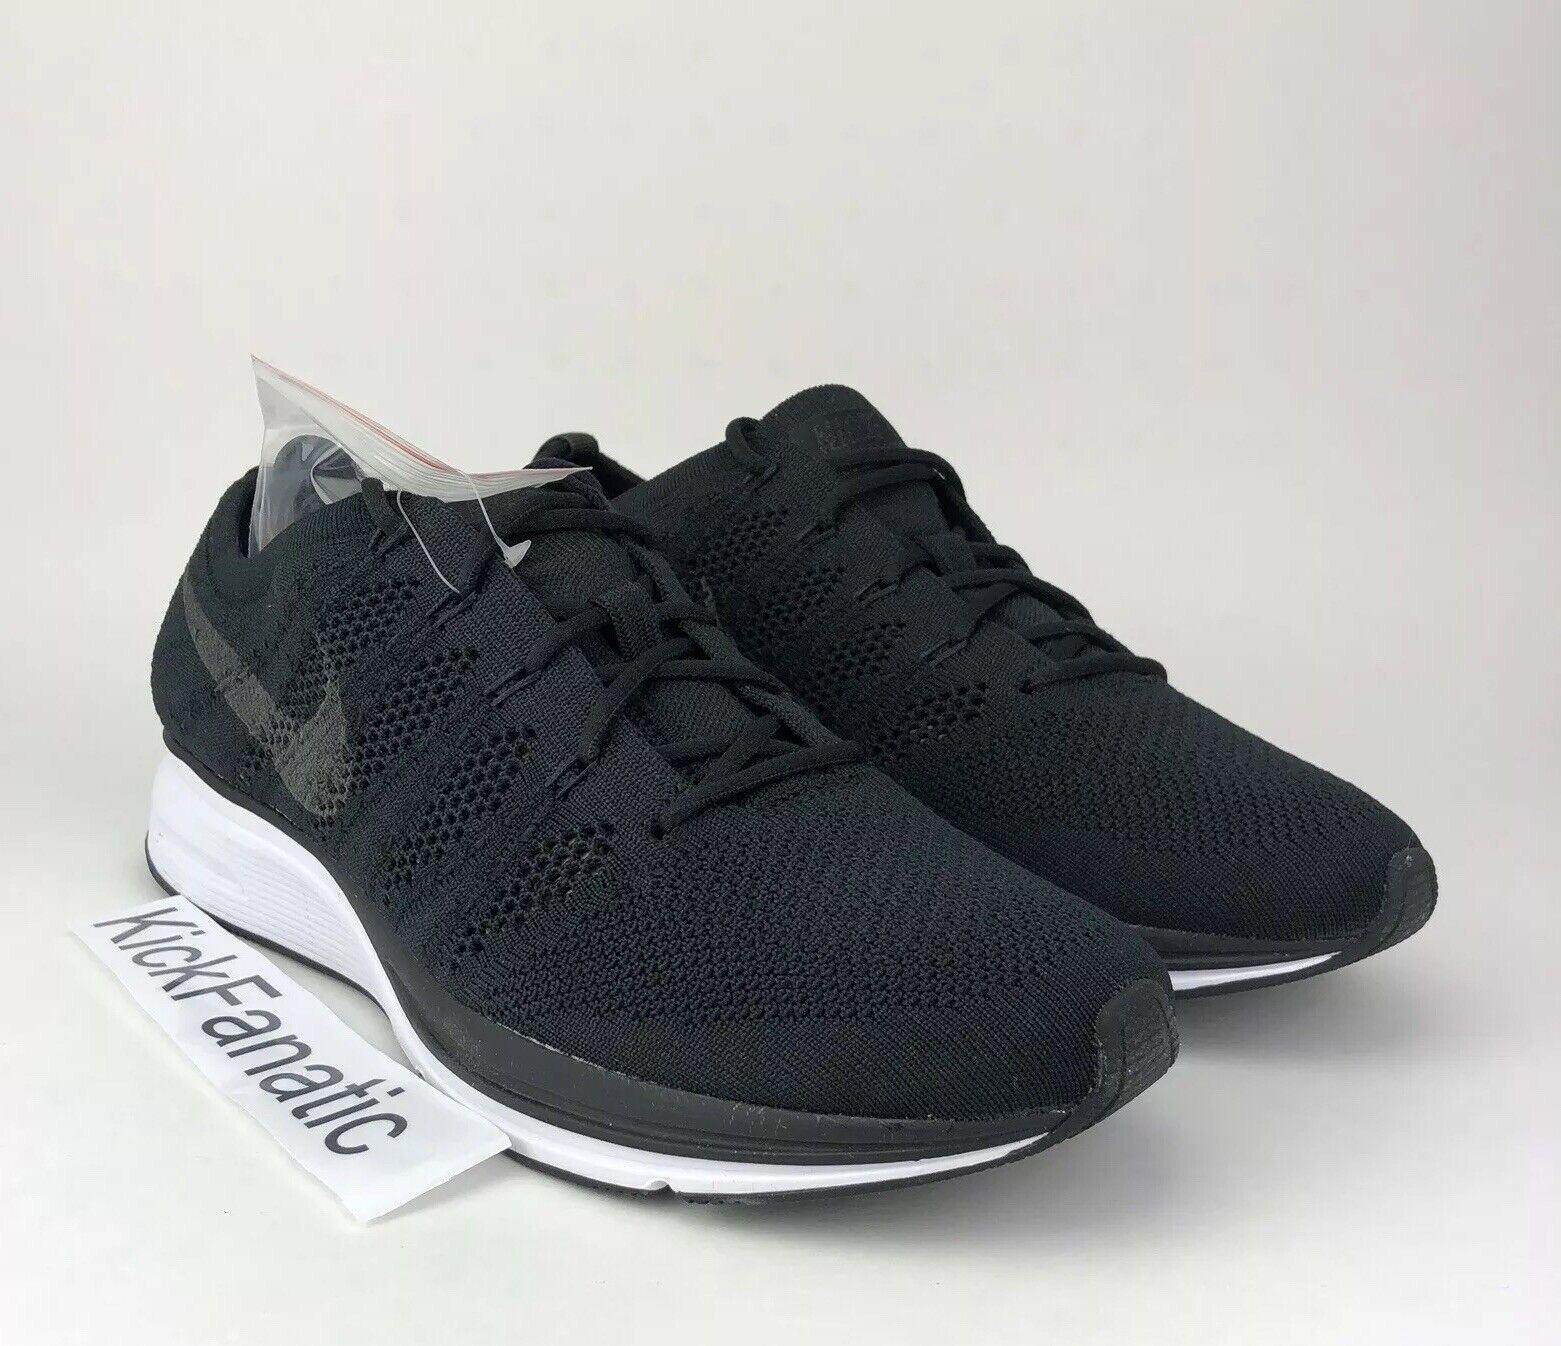 Nike Air Flyknit Trainer Noir Blanc Chaussures Homme Neuf 8 Femme 9.5 AH8396-007